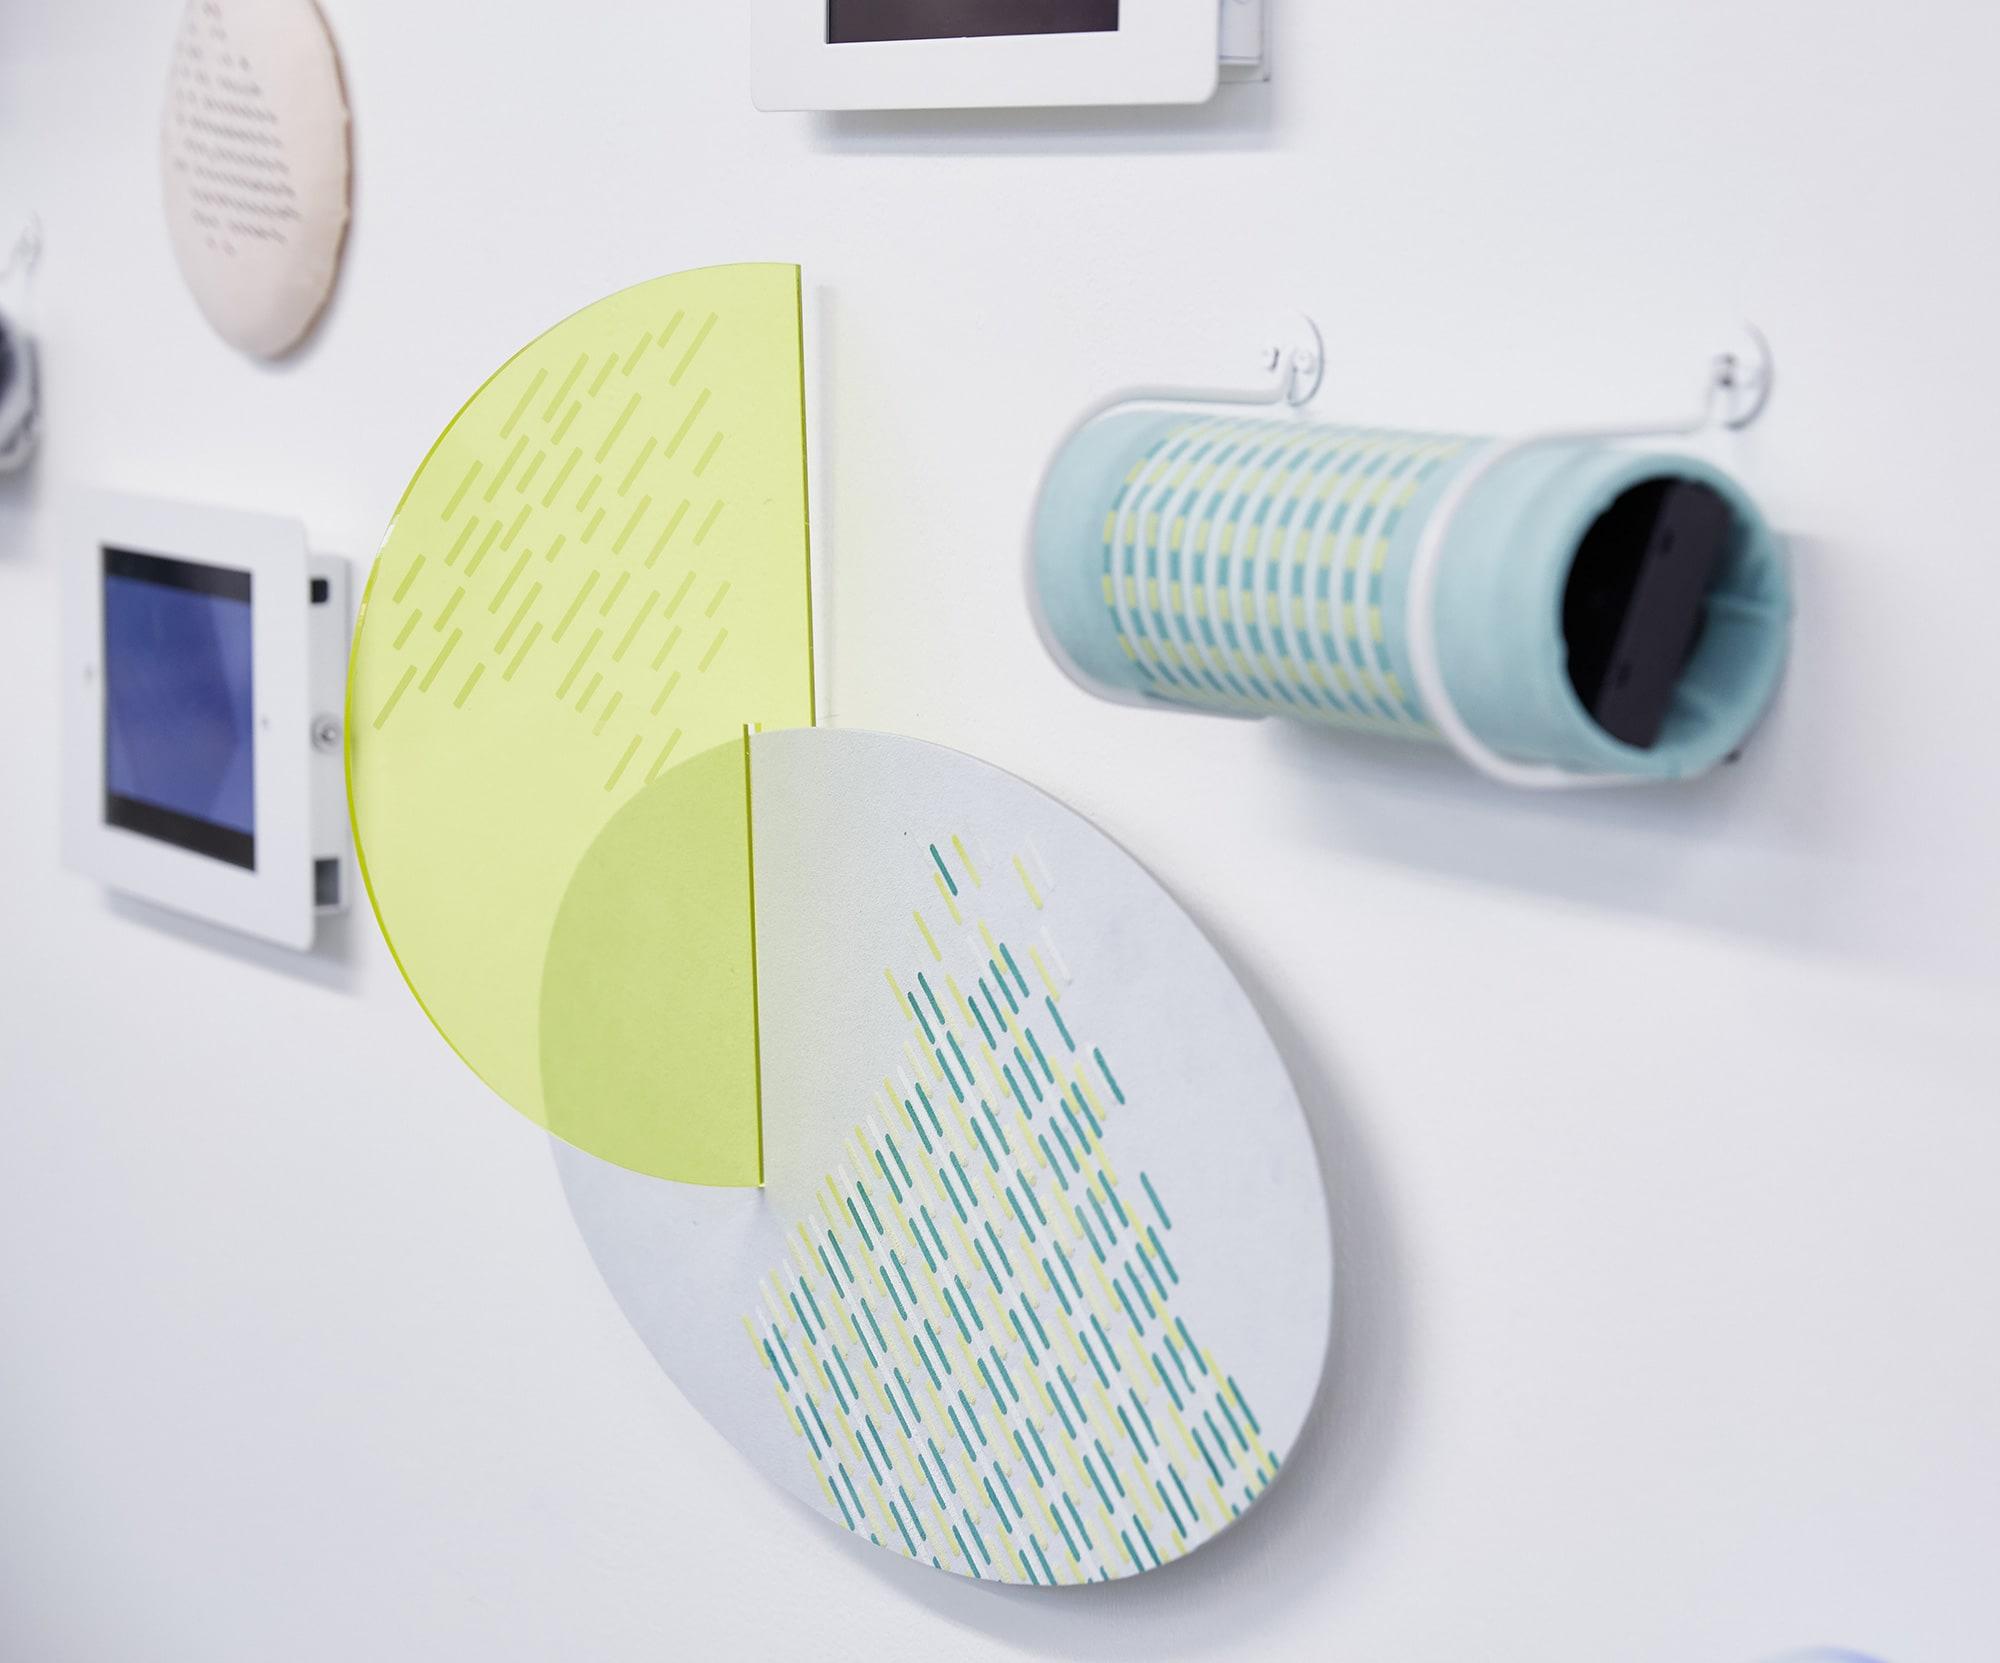 Chelsea-College-of-Arts-MA-Textile-Design-XIAOHAN-LIU-2.jpg